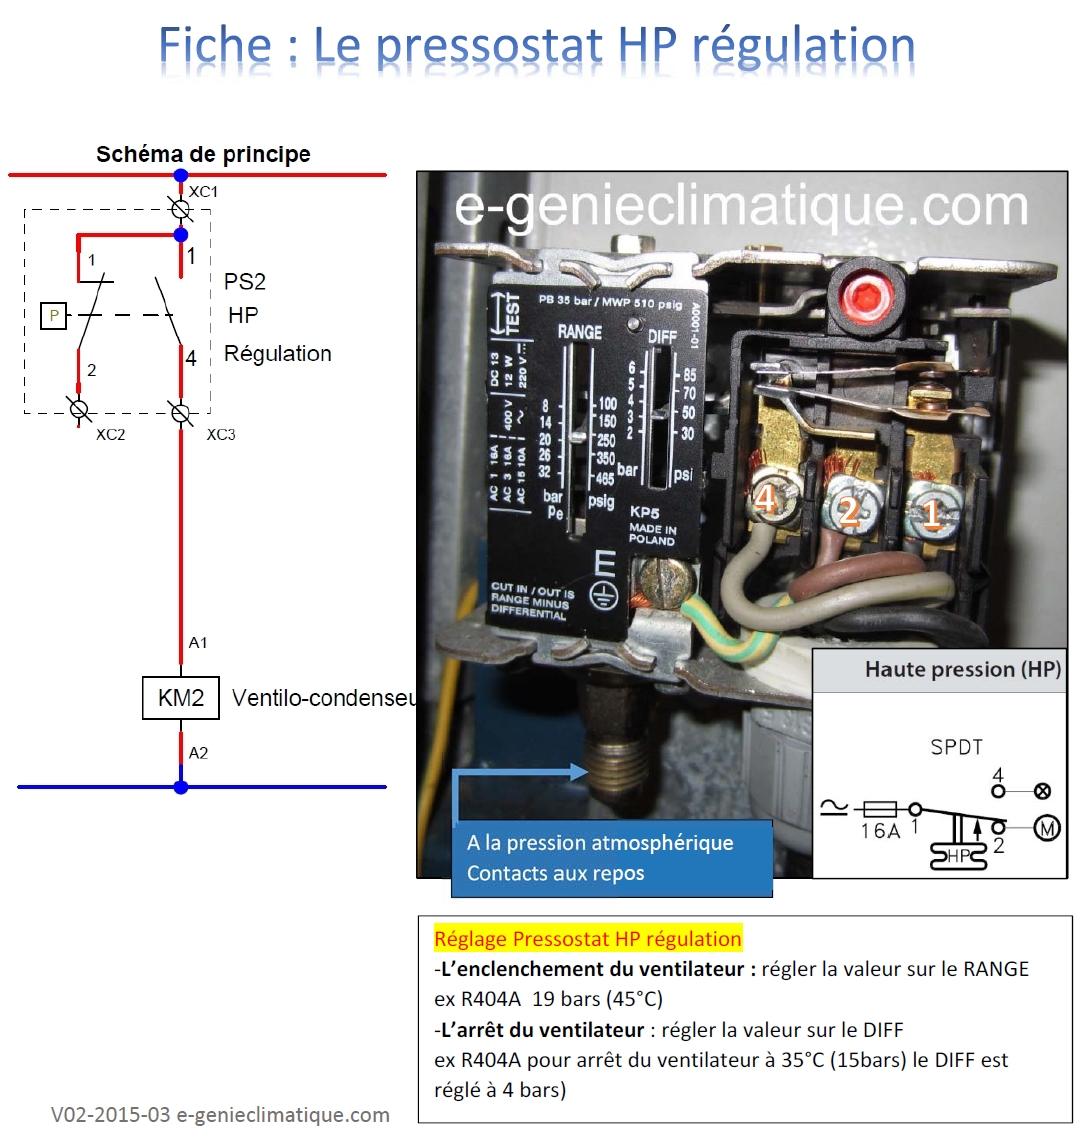 FicheV2-Le_pressostat_de_regulation_hp_ventilo_condenseur